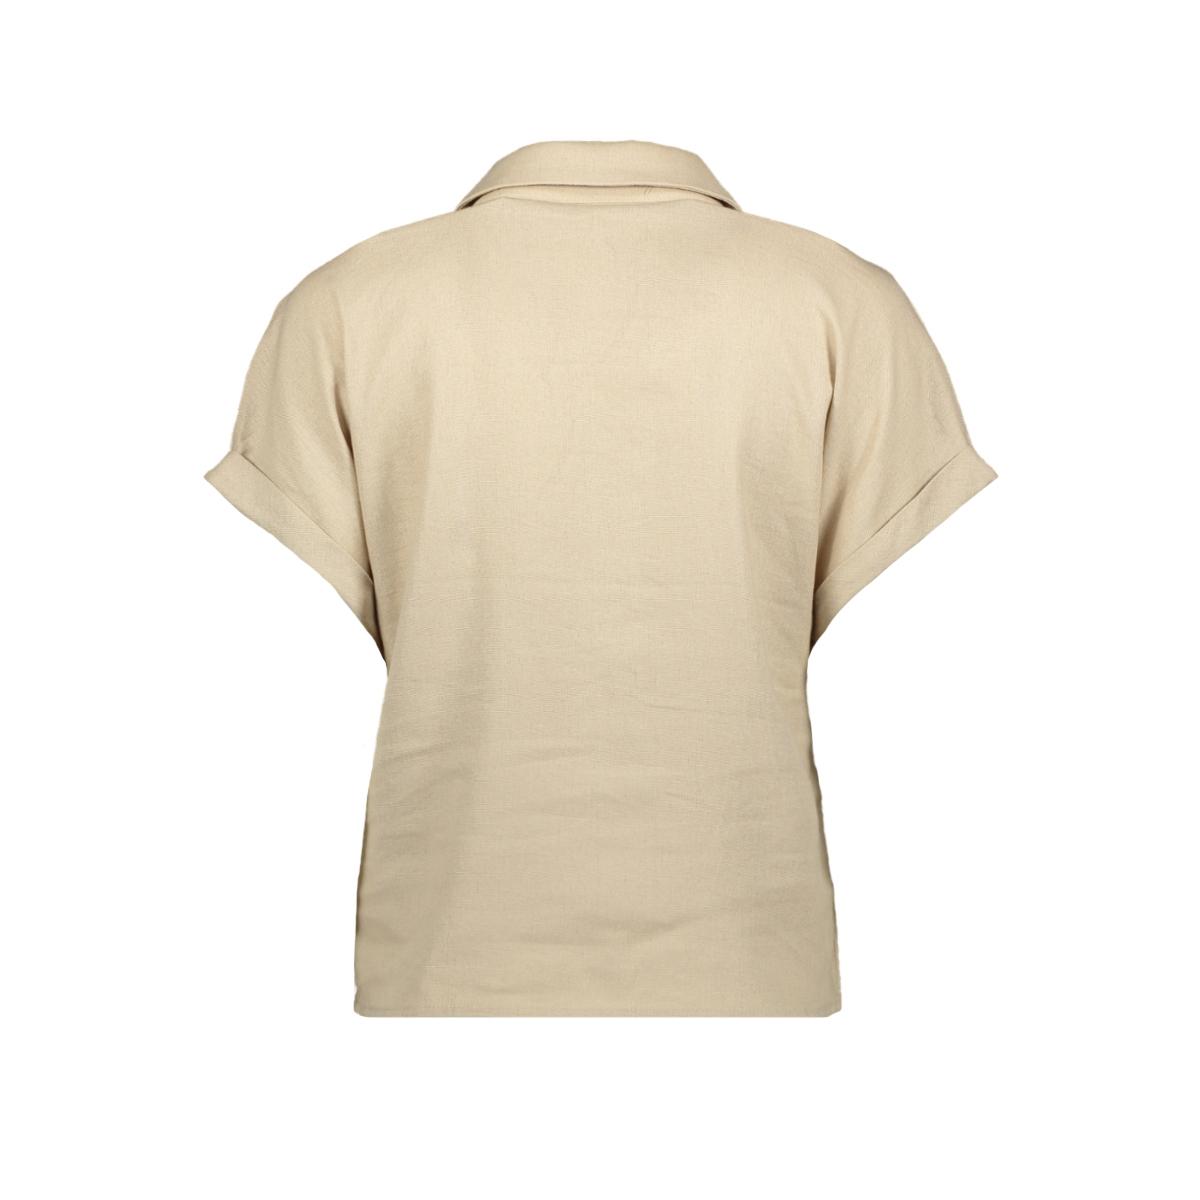 objnans s/s shirt 107 div 23032306 object blouse humus